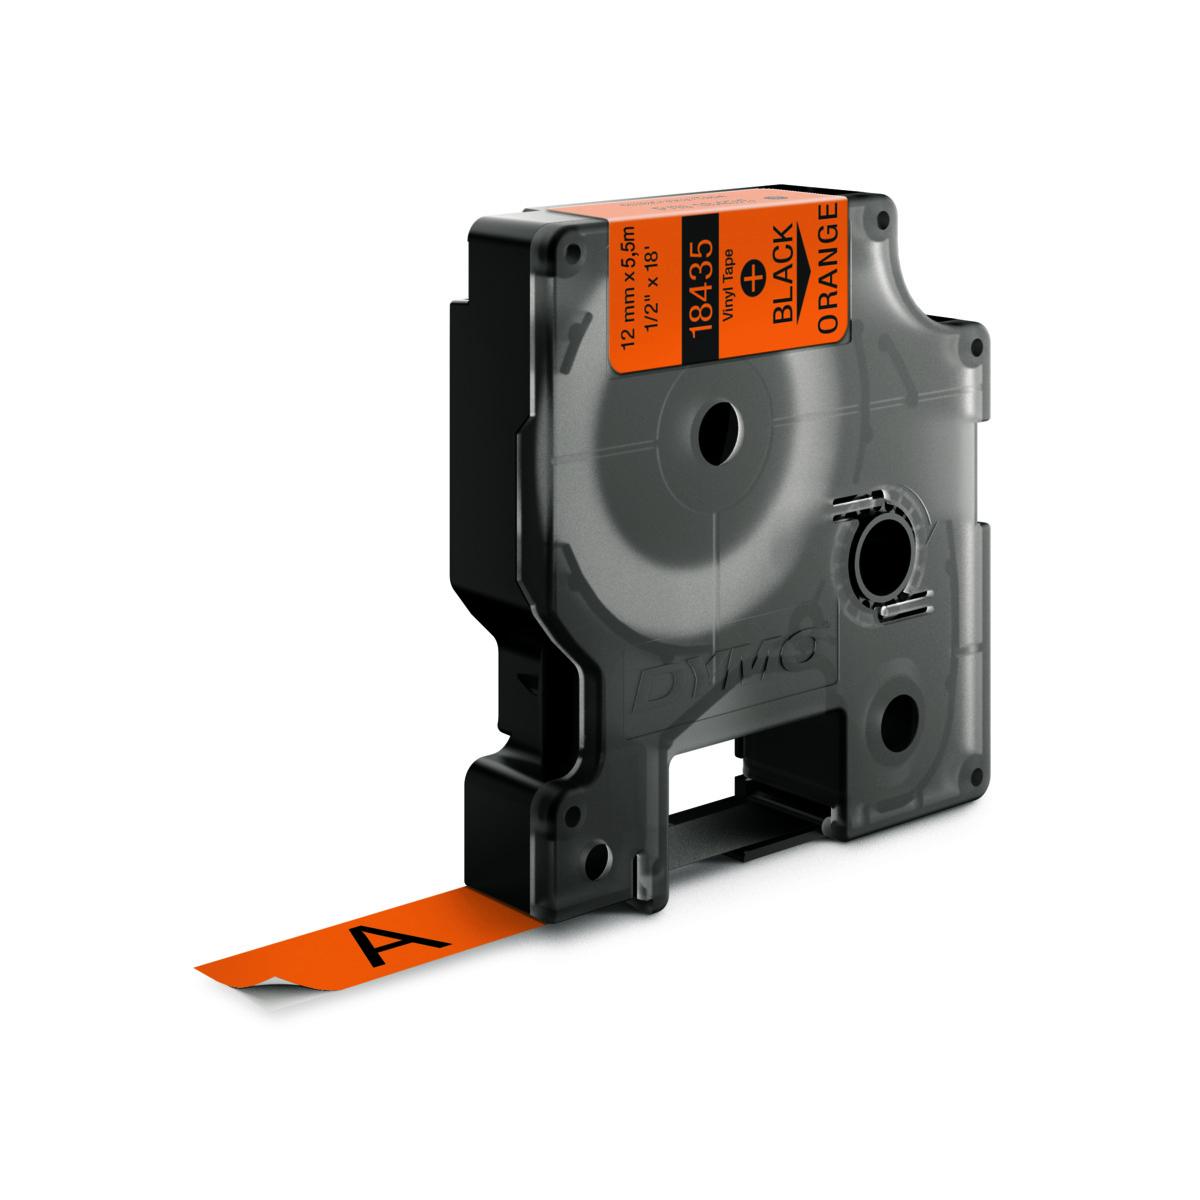 Dymo RHINO 18435 IND - vinyl label tape - 12mm zwart op oranje